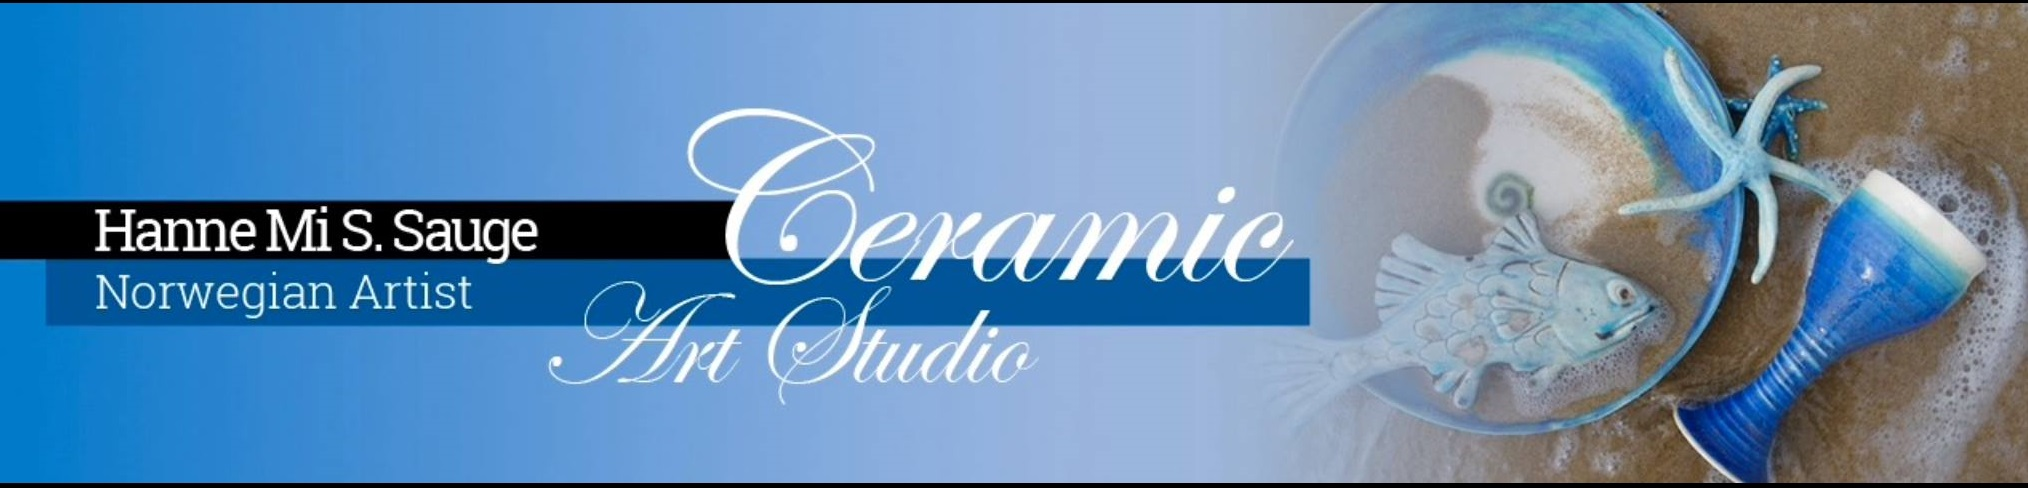 Hanne Mi S. Ceramic Art Studio - Copy